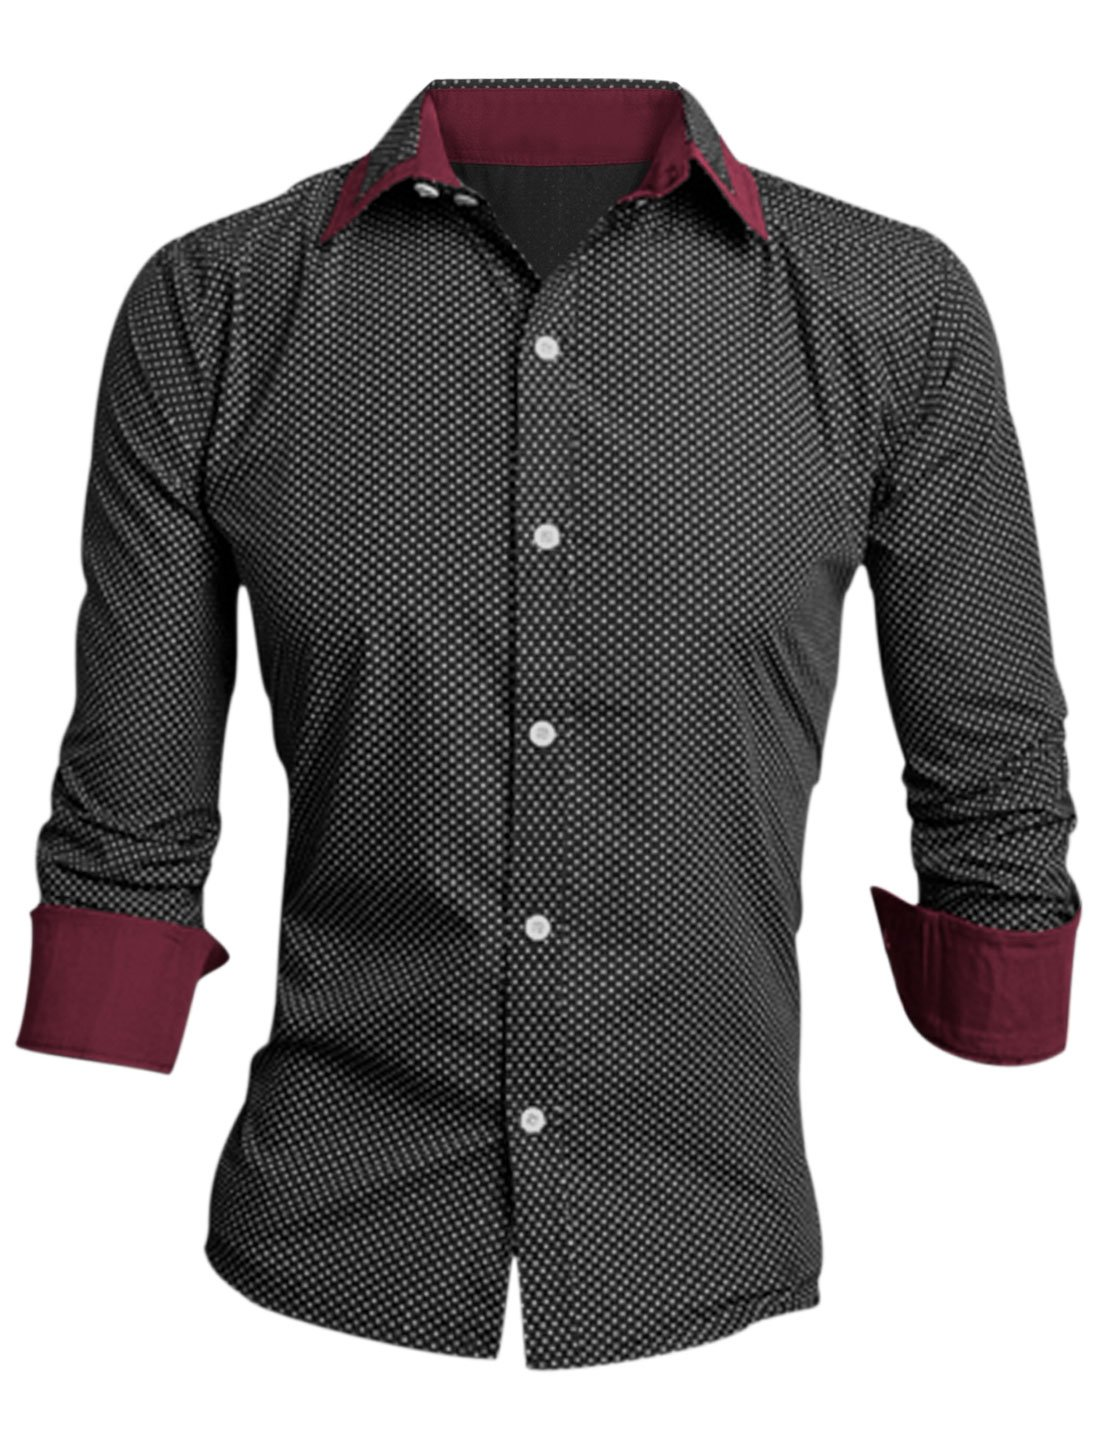 Allegra K Men Point Collar Long Sleeve Polka Dots Prints Dress Shirts a14092500ux1054